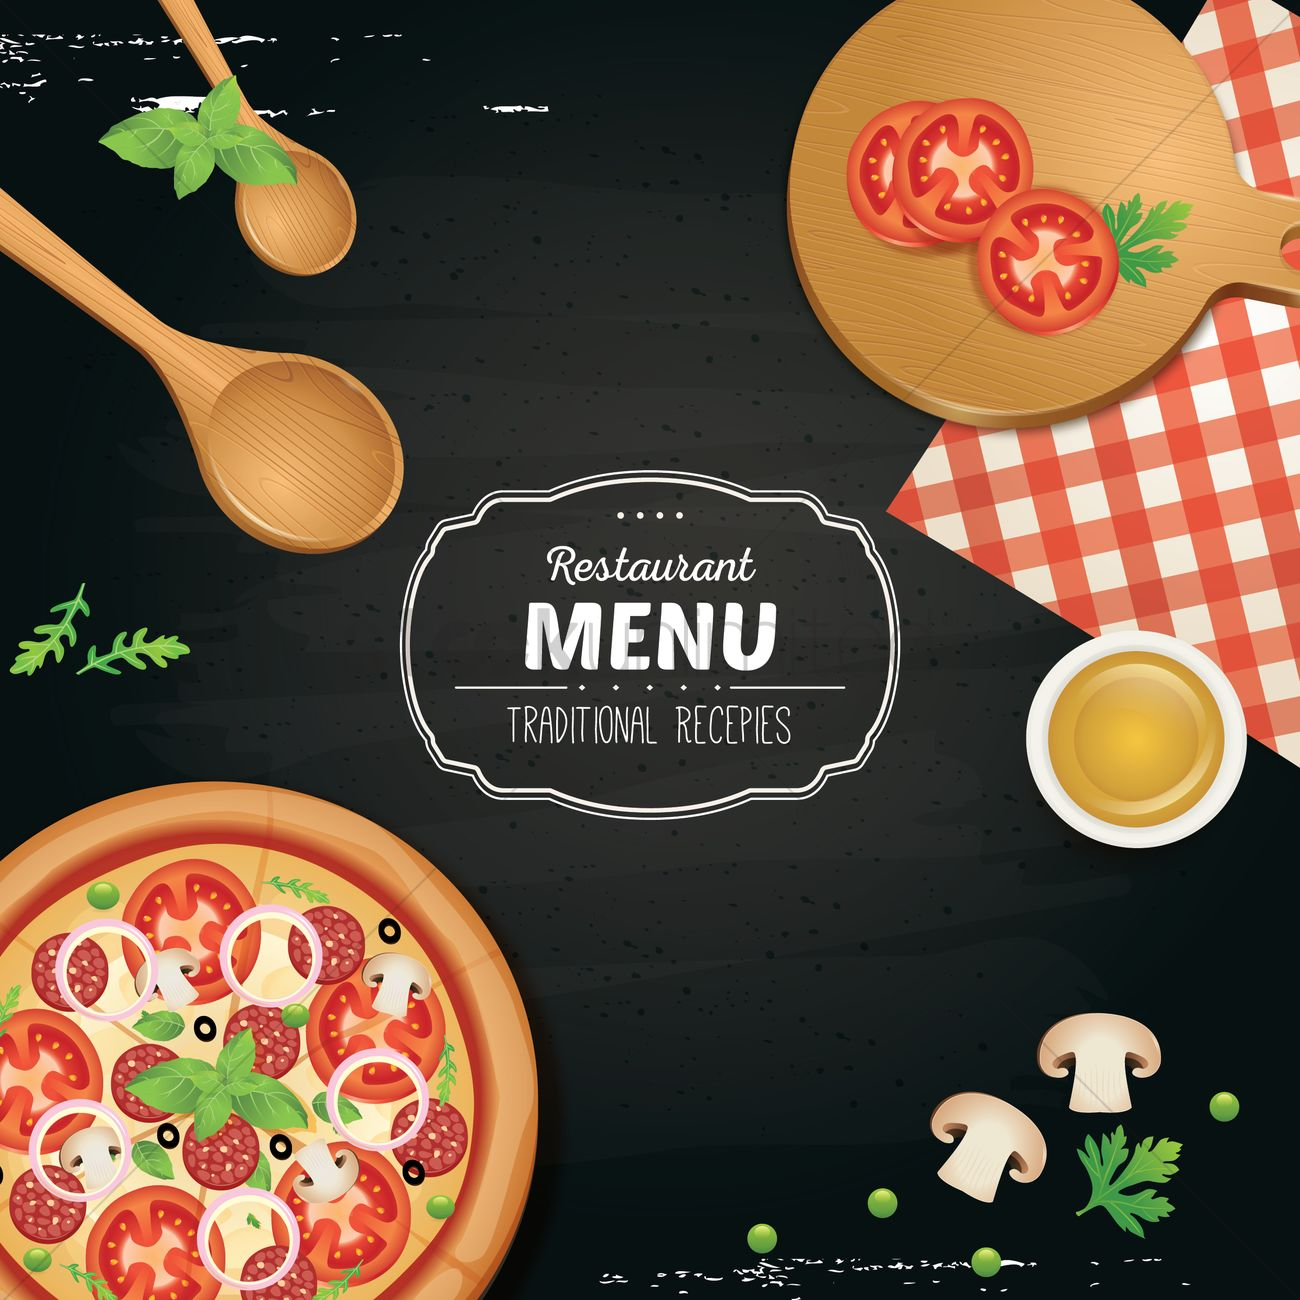 Restaurant Menu Wallpaper Vector Graphic